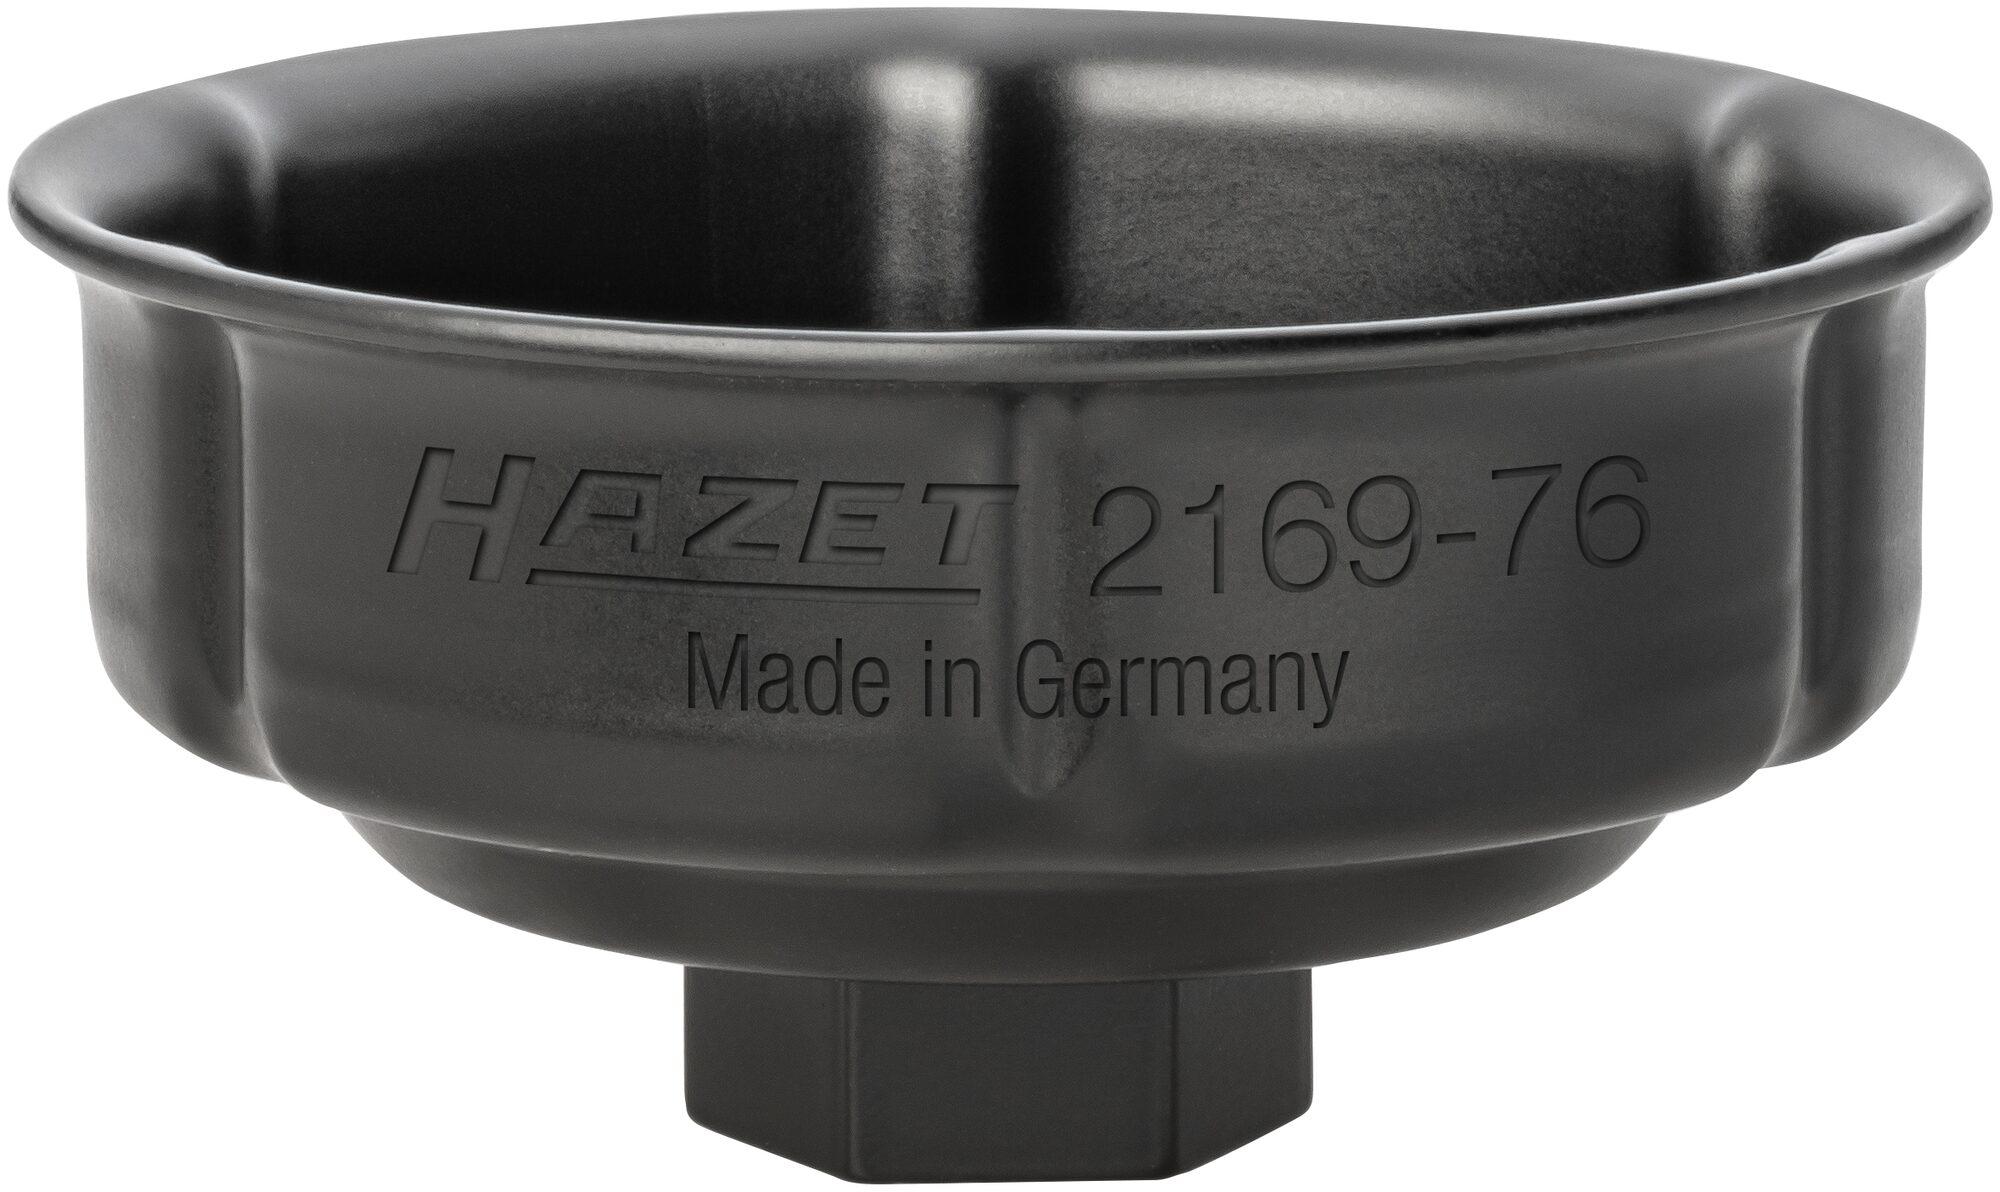 HAZET Ölfilter-Schlüssel 2169-76 ∙ Vierkant hohl 12,5 mm (1/2 Zoll) ∙ Rillenprofil ∙ 85 mm